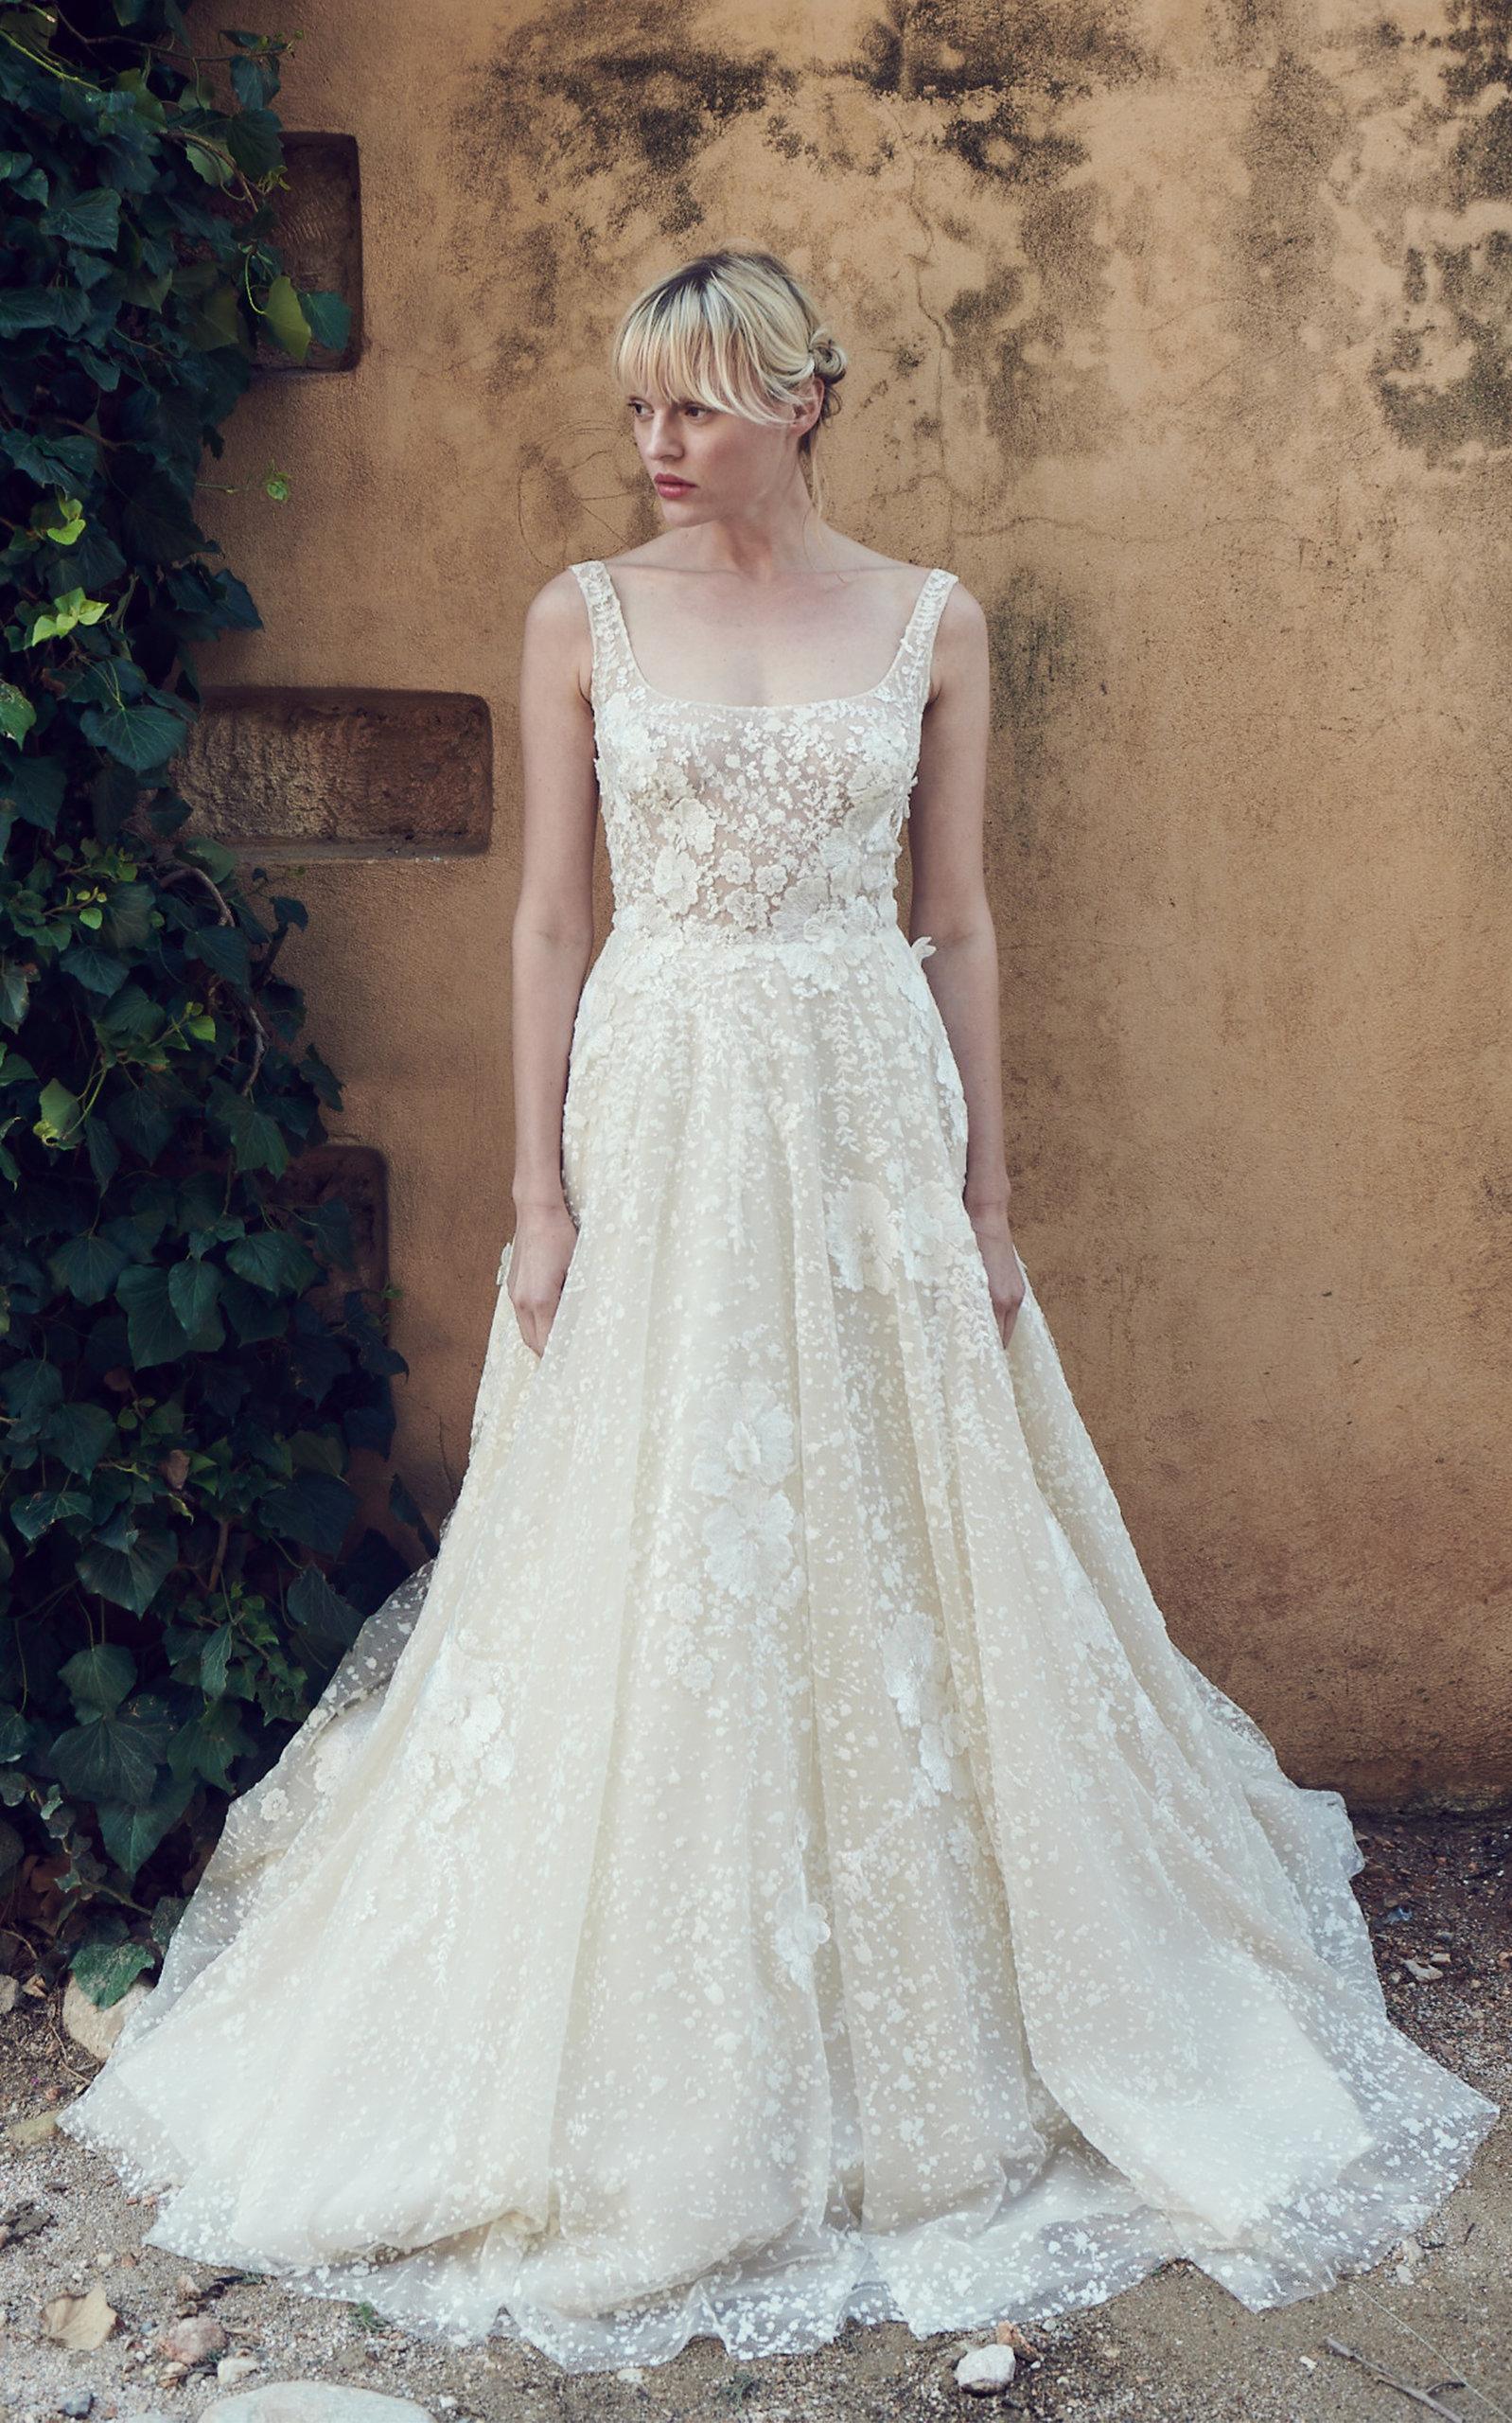 COSTARELLOS BRIDAL Tulle Ballerina Bodice Peplum Gown in White